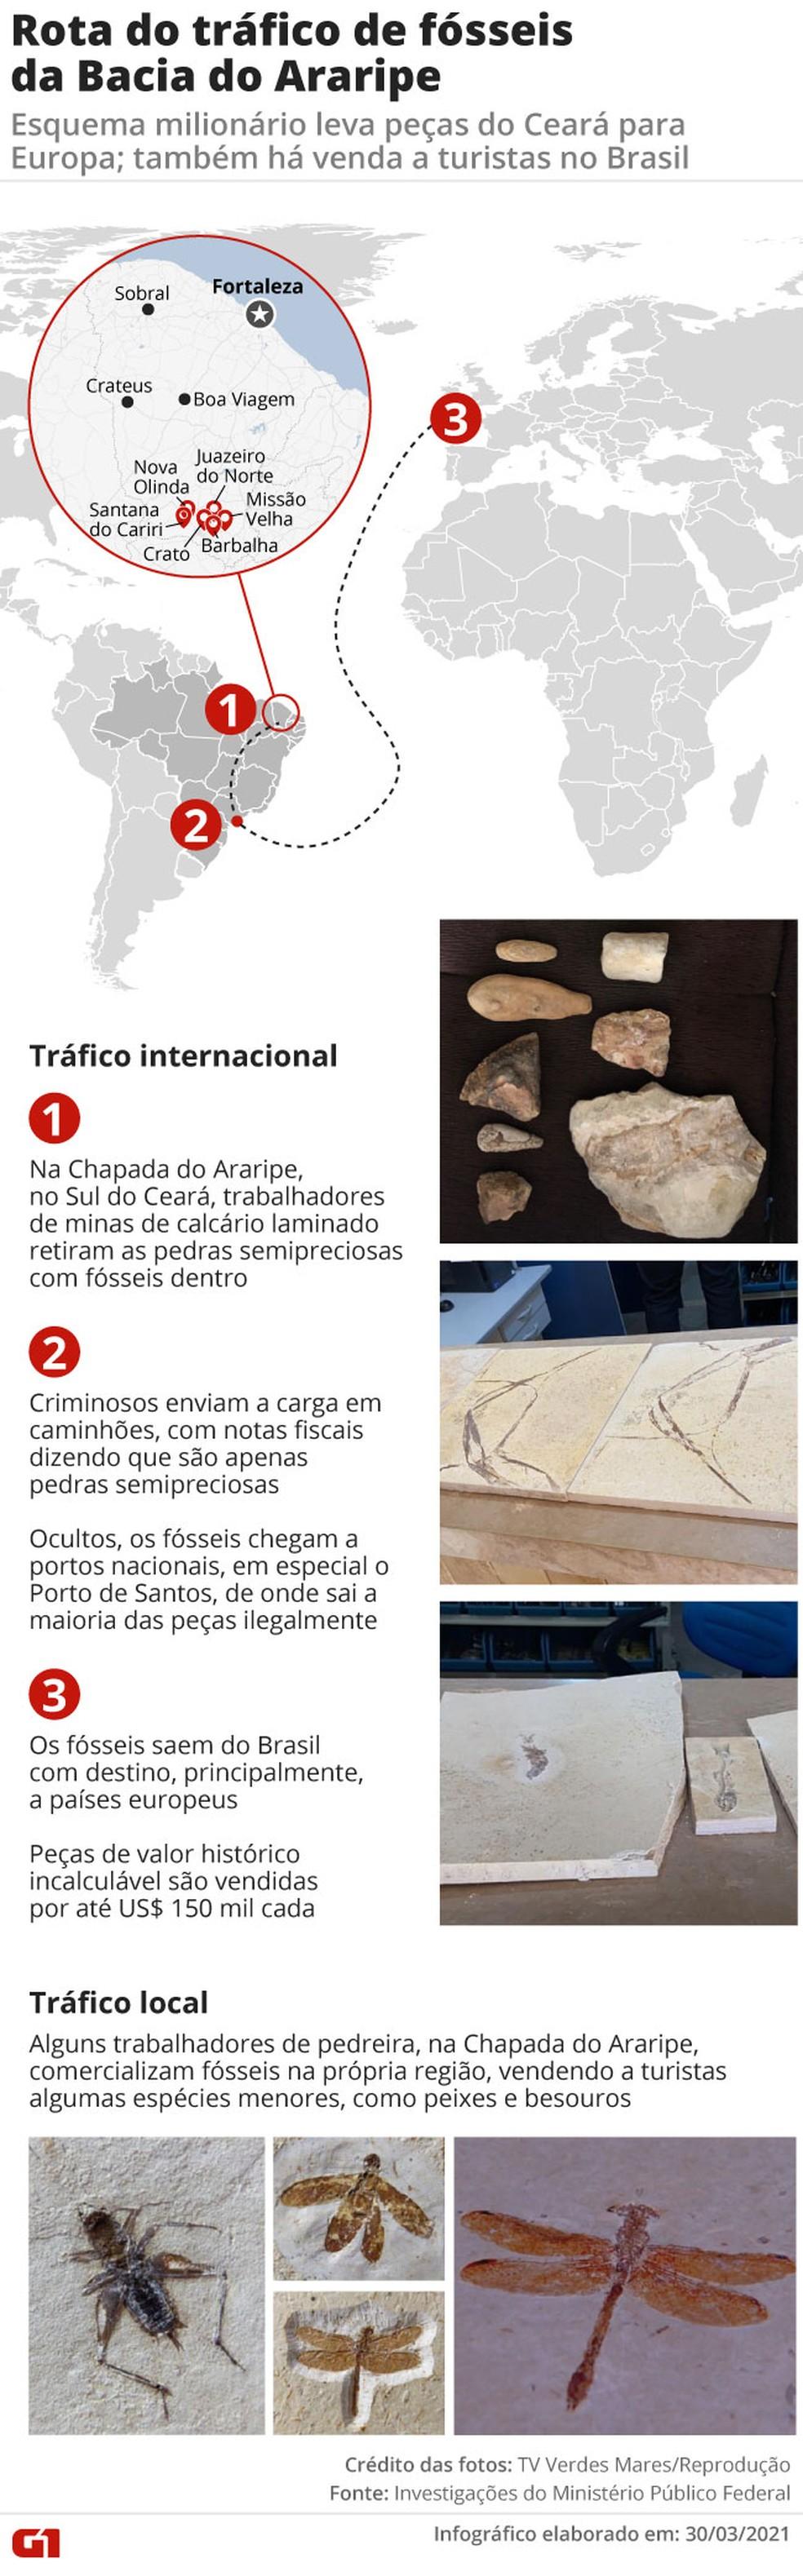 Tráfico de fósseis no Ceará — Foto: Arte/G1